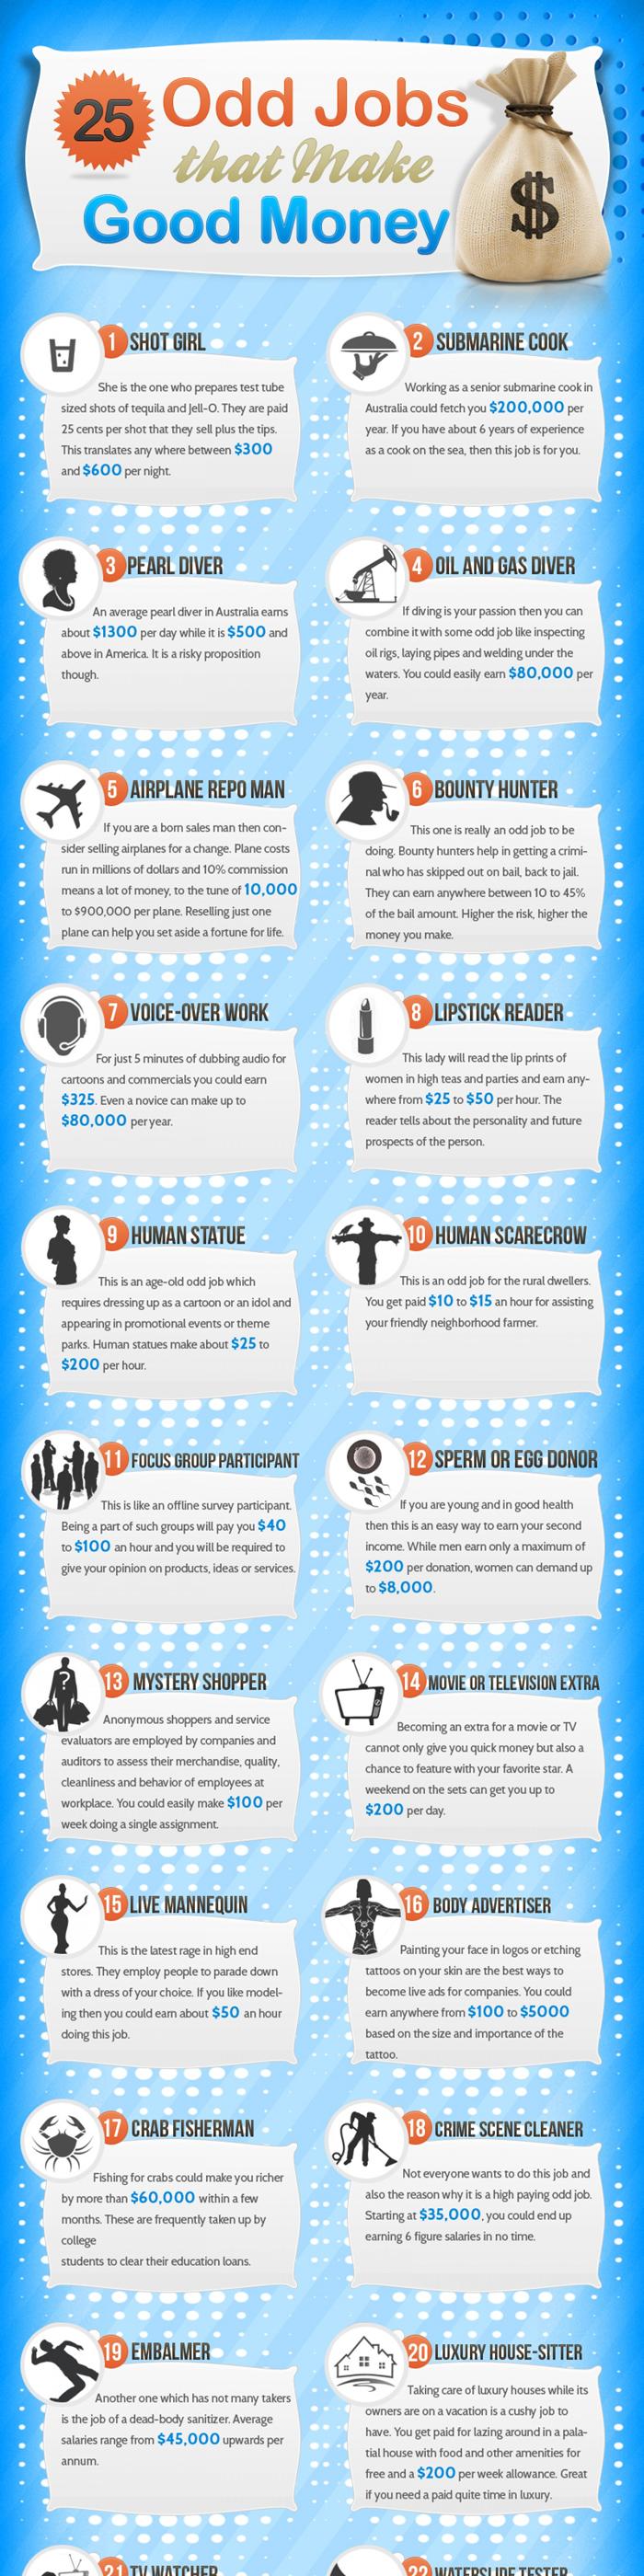 25 Odd Jobs that Make Good Money | www.TheHeavyPurse.com